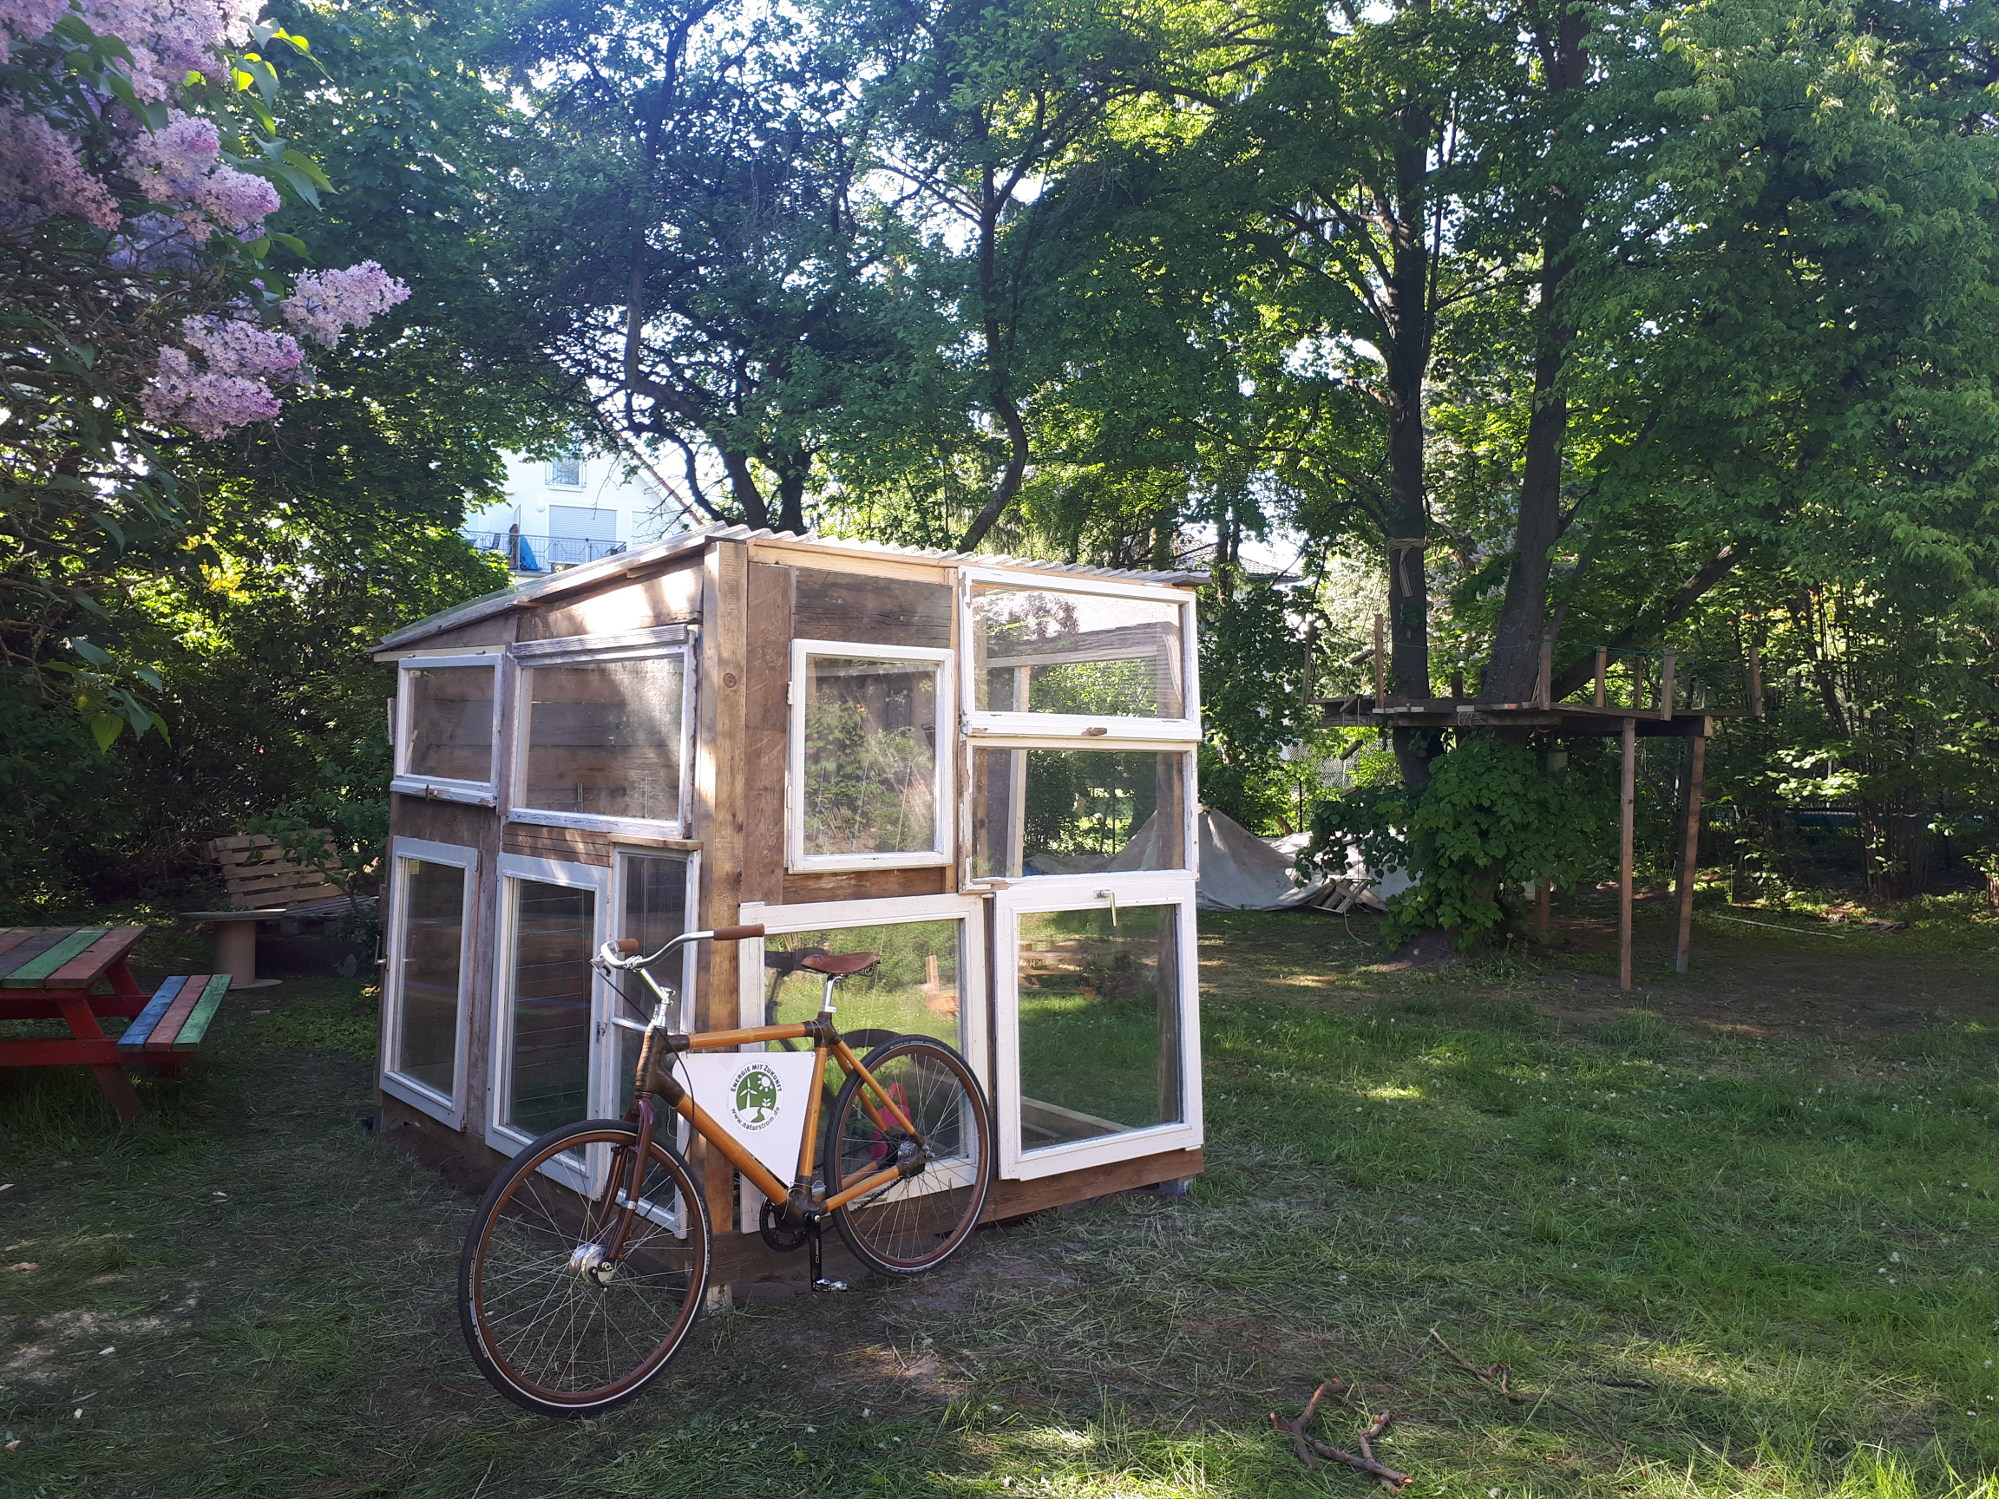 GardenBlitz_FU-Berlin_AStA-Villa_20180506_165808